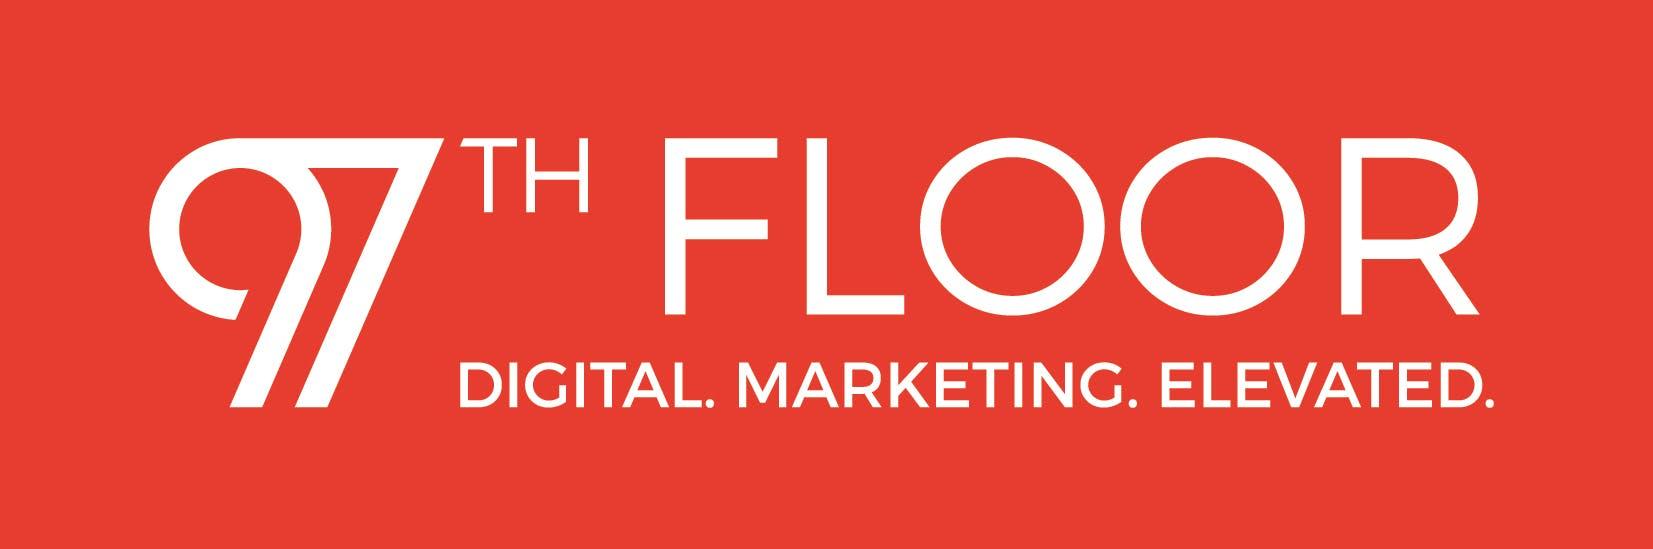 97th Floor Digital Marketing Agency